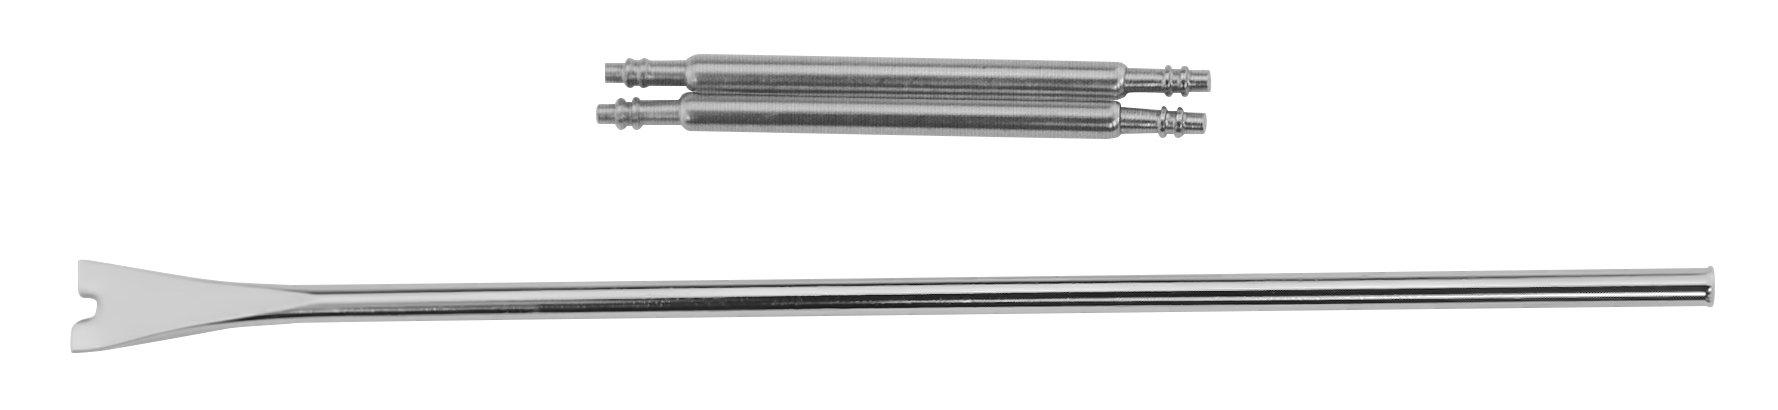 RotWeiViolettRosa-Stoff-Uhrenarmband-Dornschliee-18mm-Uhrenarmband